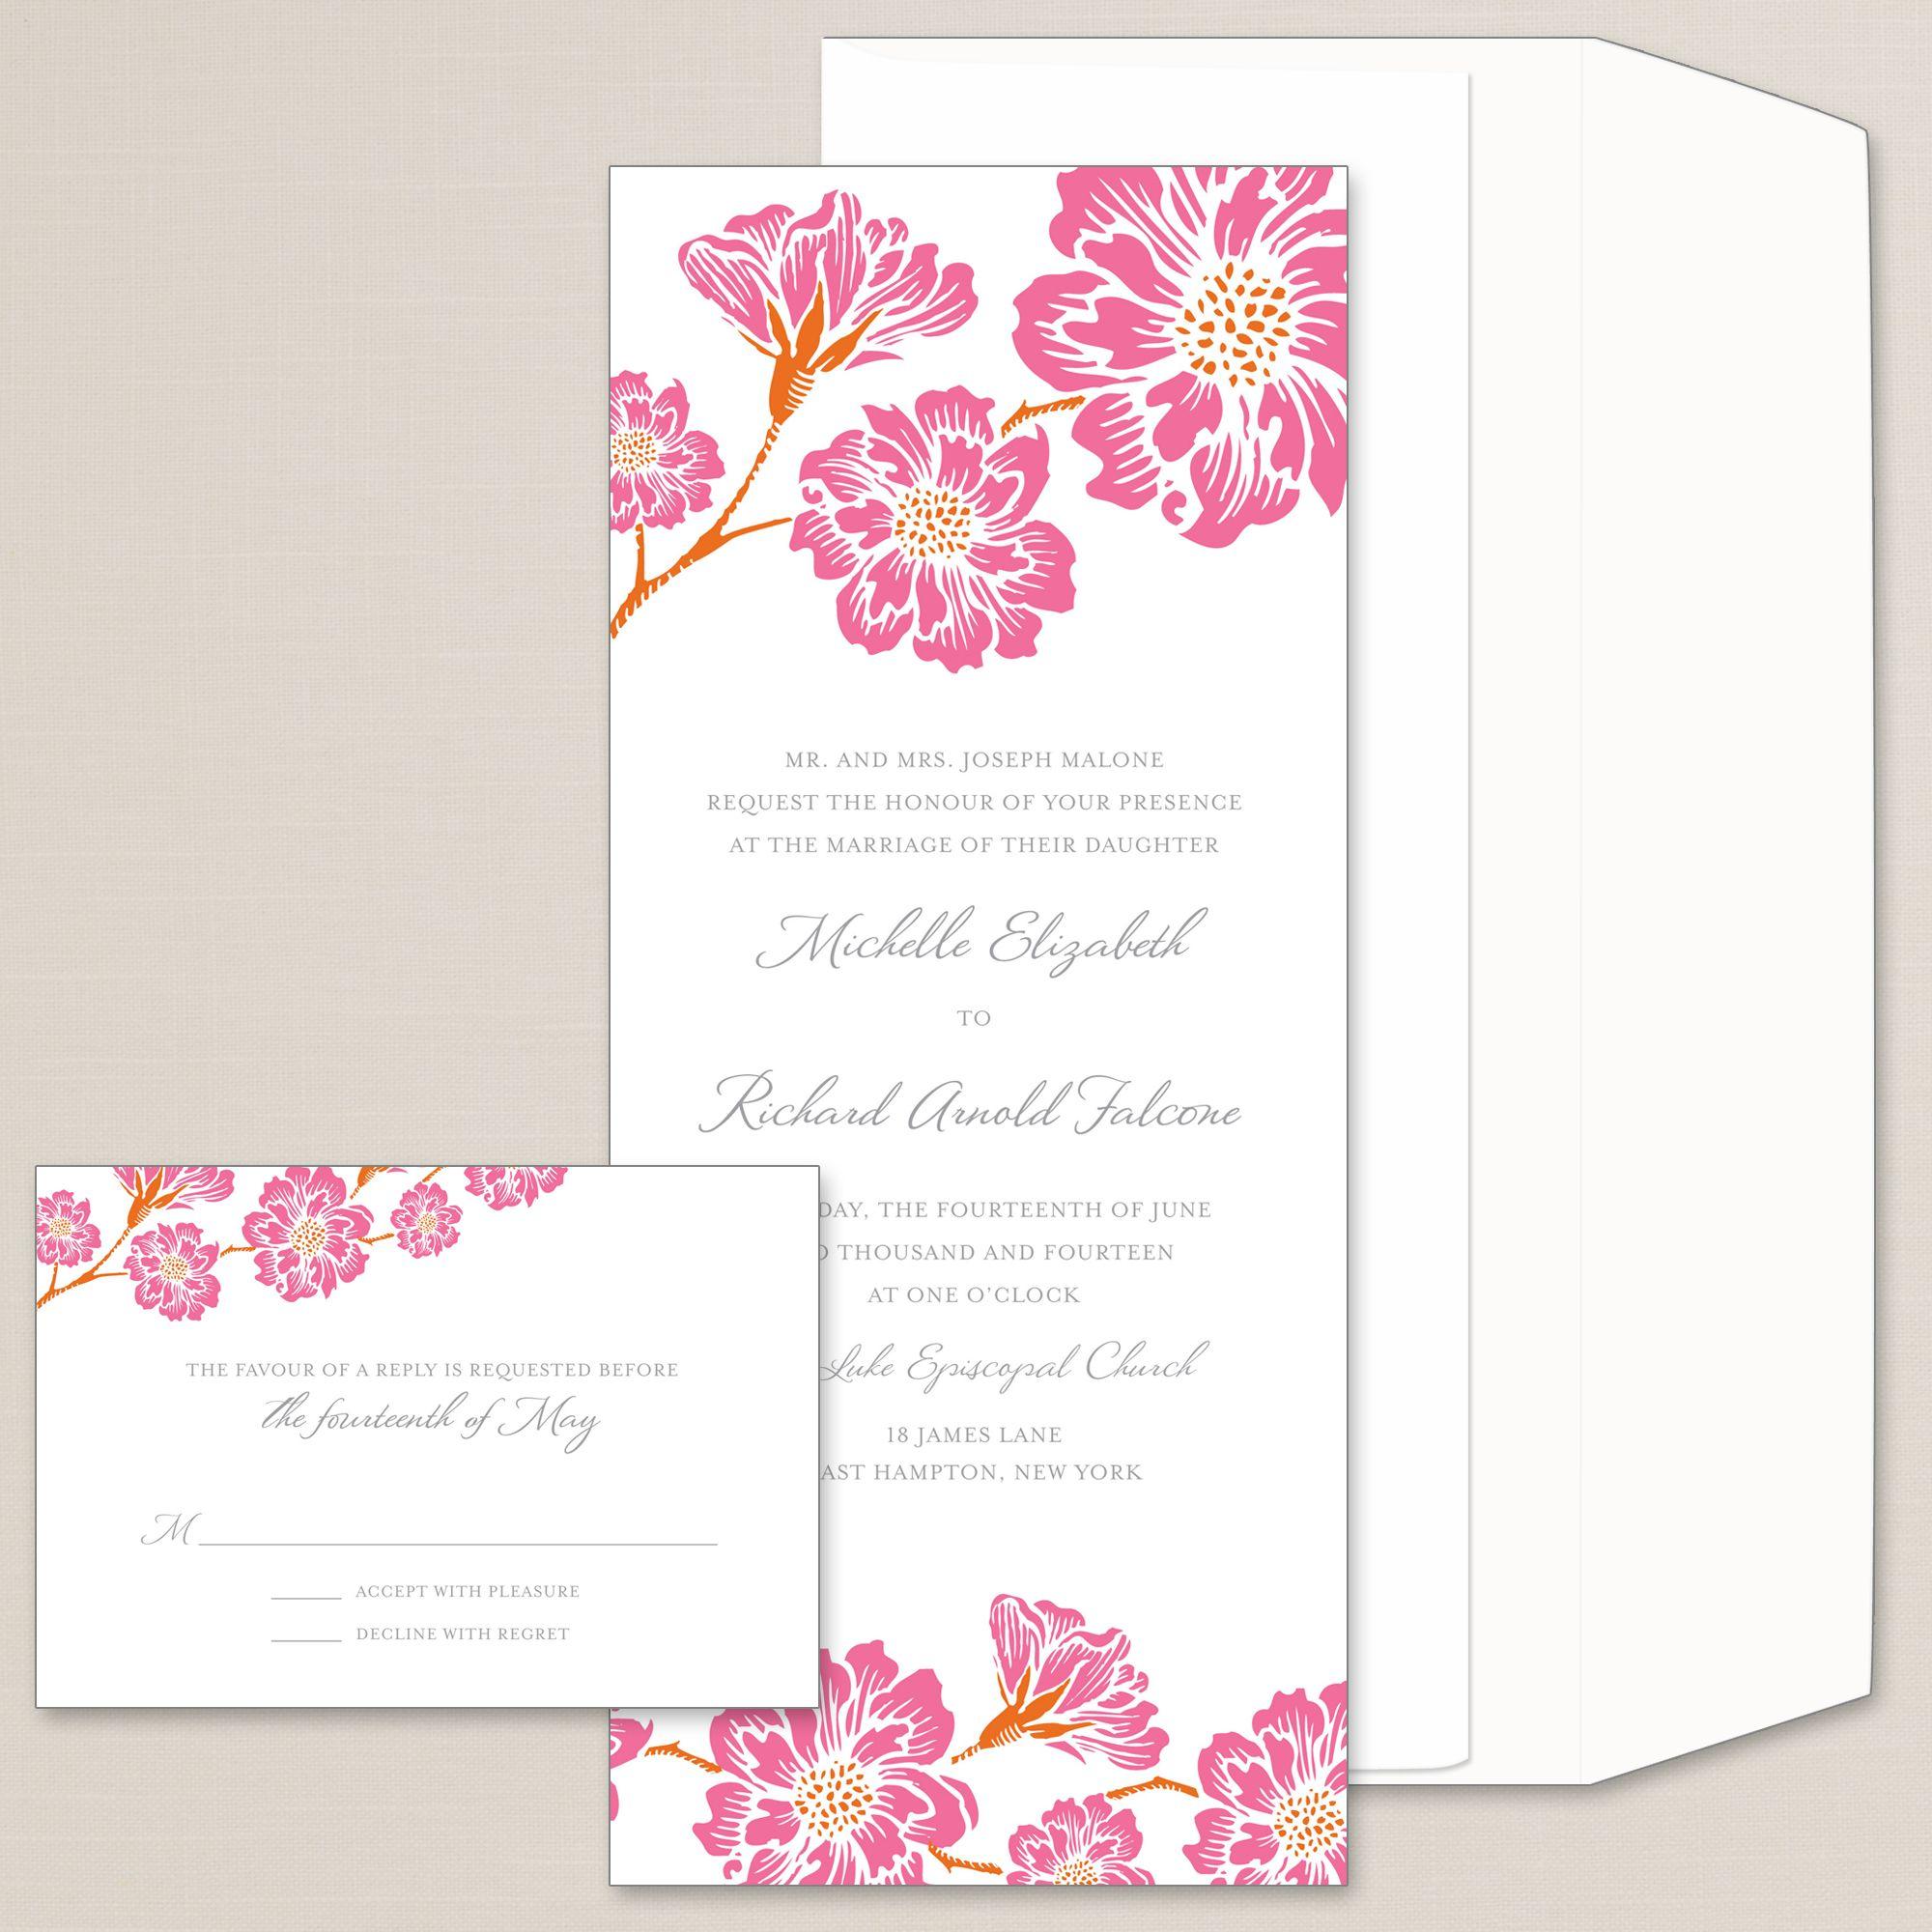 Moss Roses Wedding Invitation